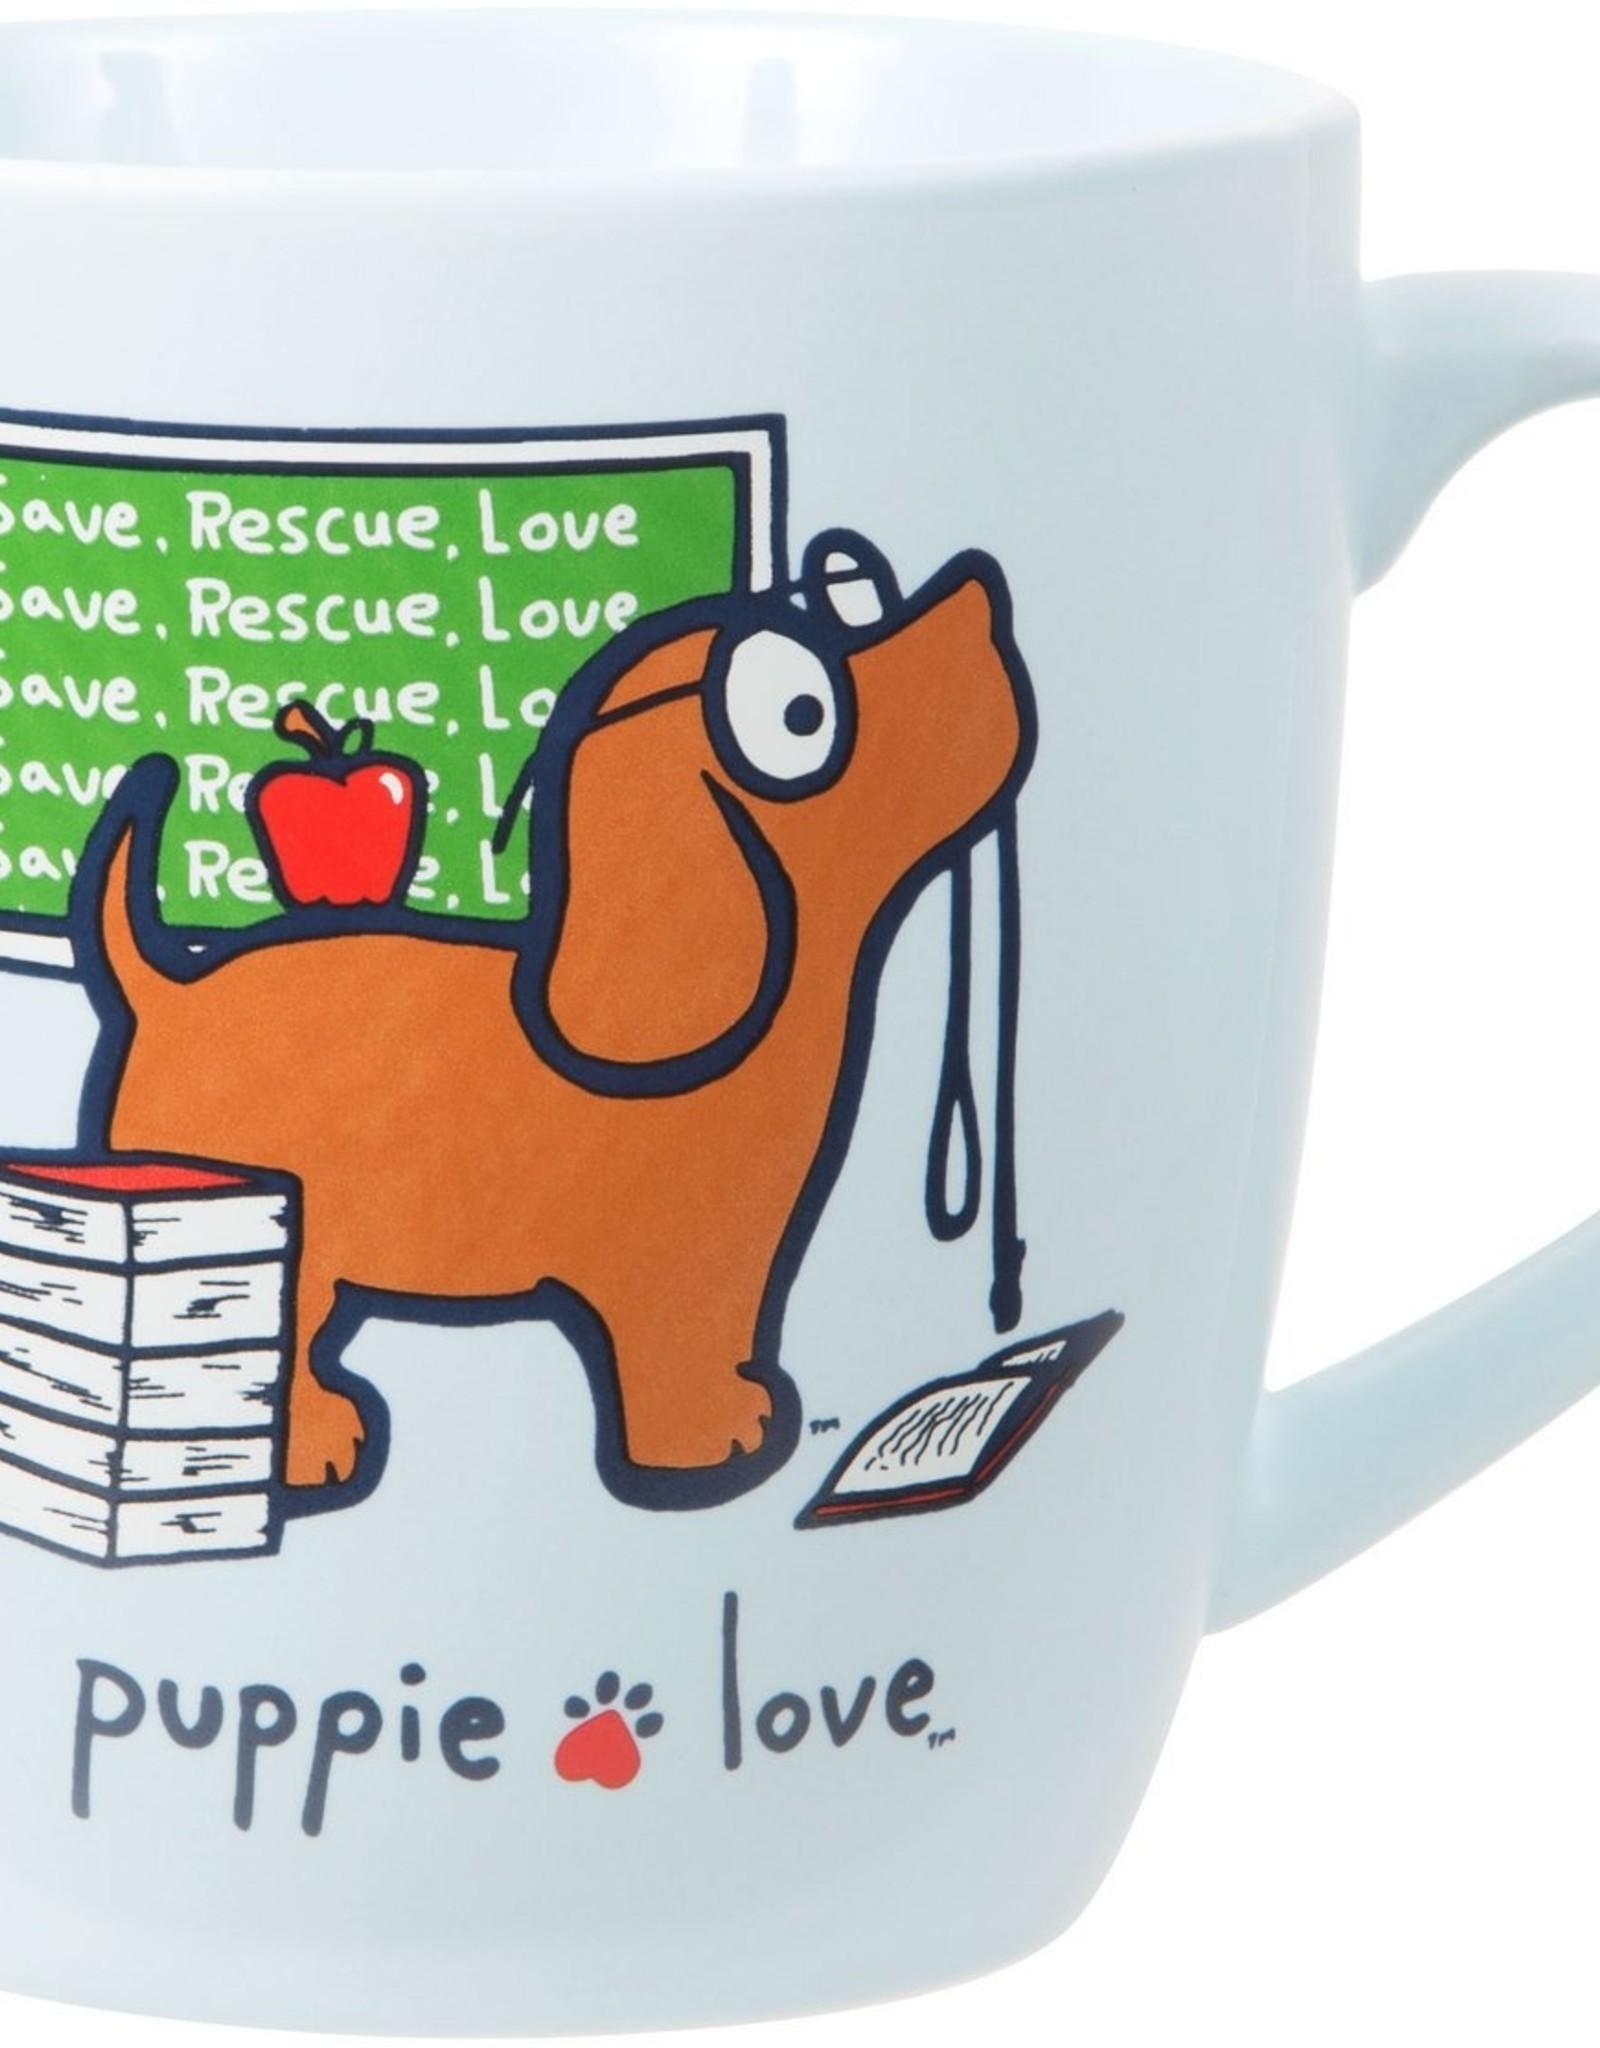 PAVILION Teacher Puppie Love Mug